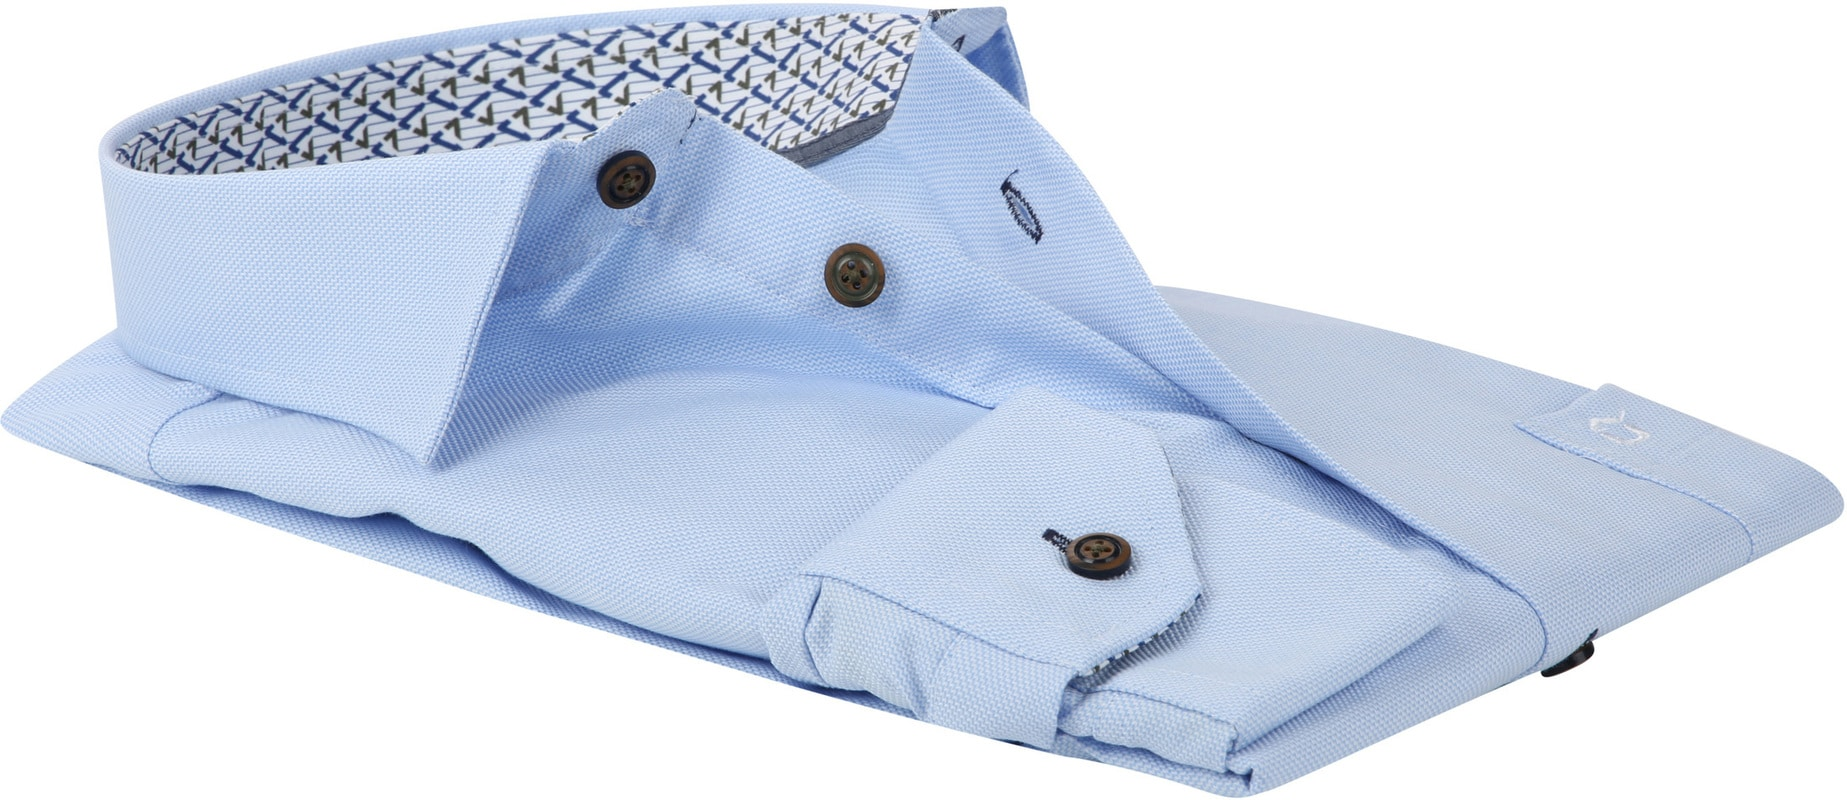 Ledub Overhemd MF Dessin Lichtblauw foto 2